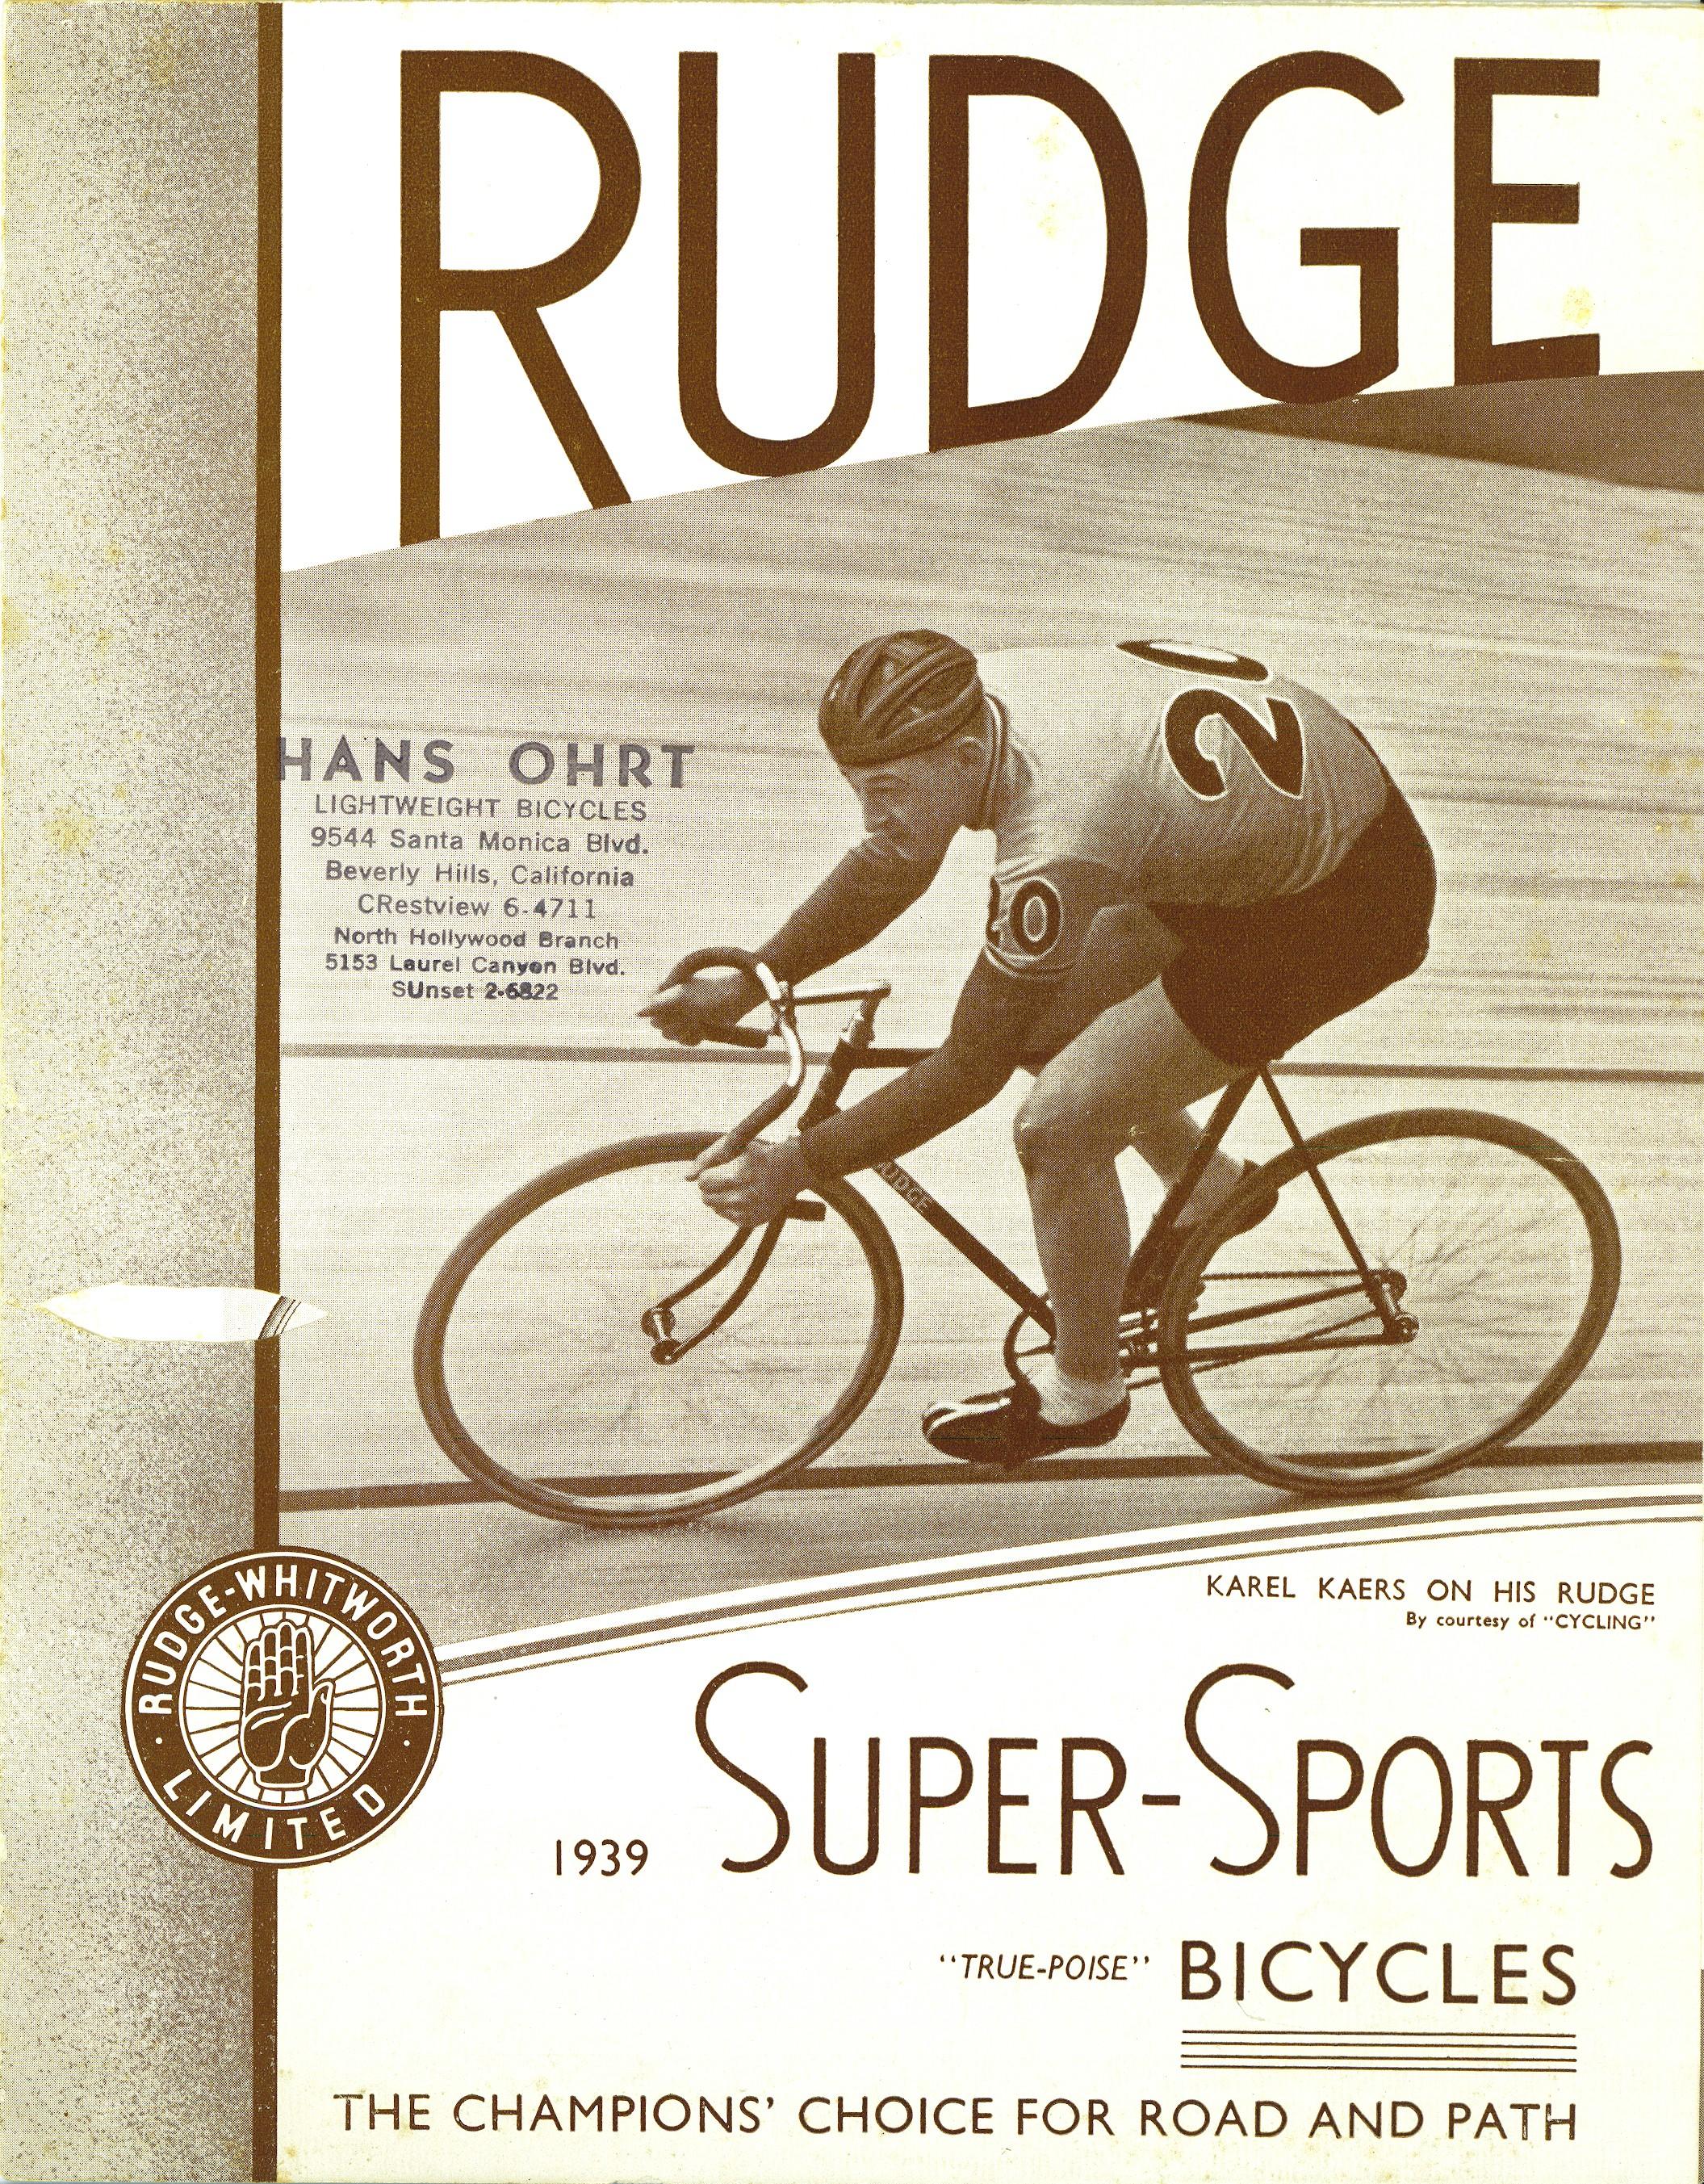 pics bike catalogs rudge 39 39 super sports. Black Bedroom Furniture Sets. Home Design Ideas